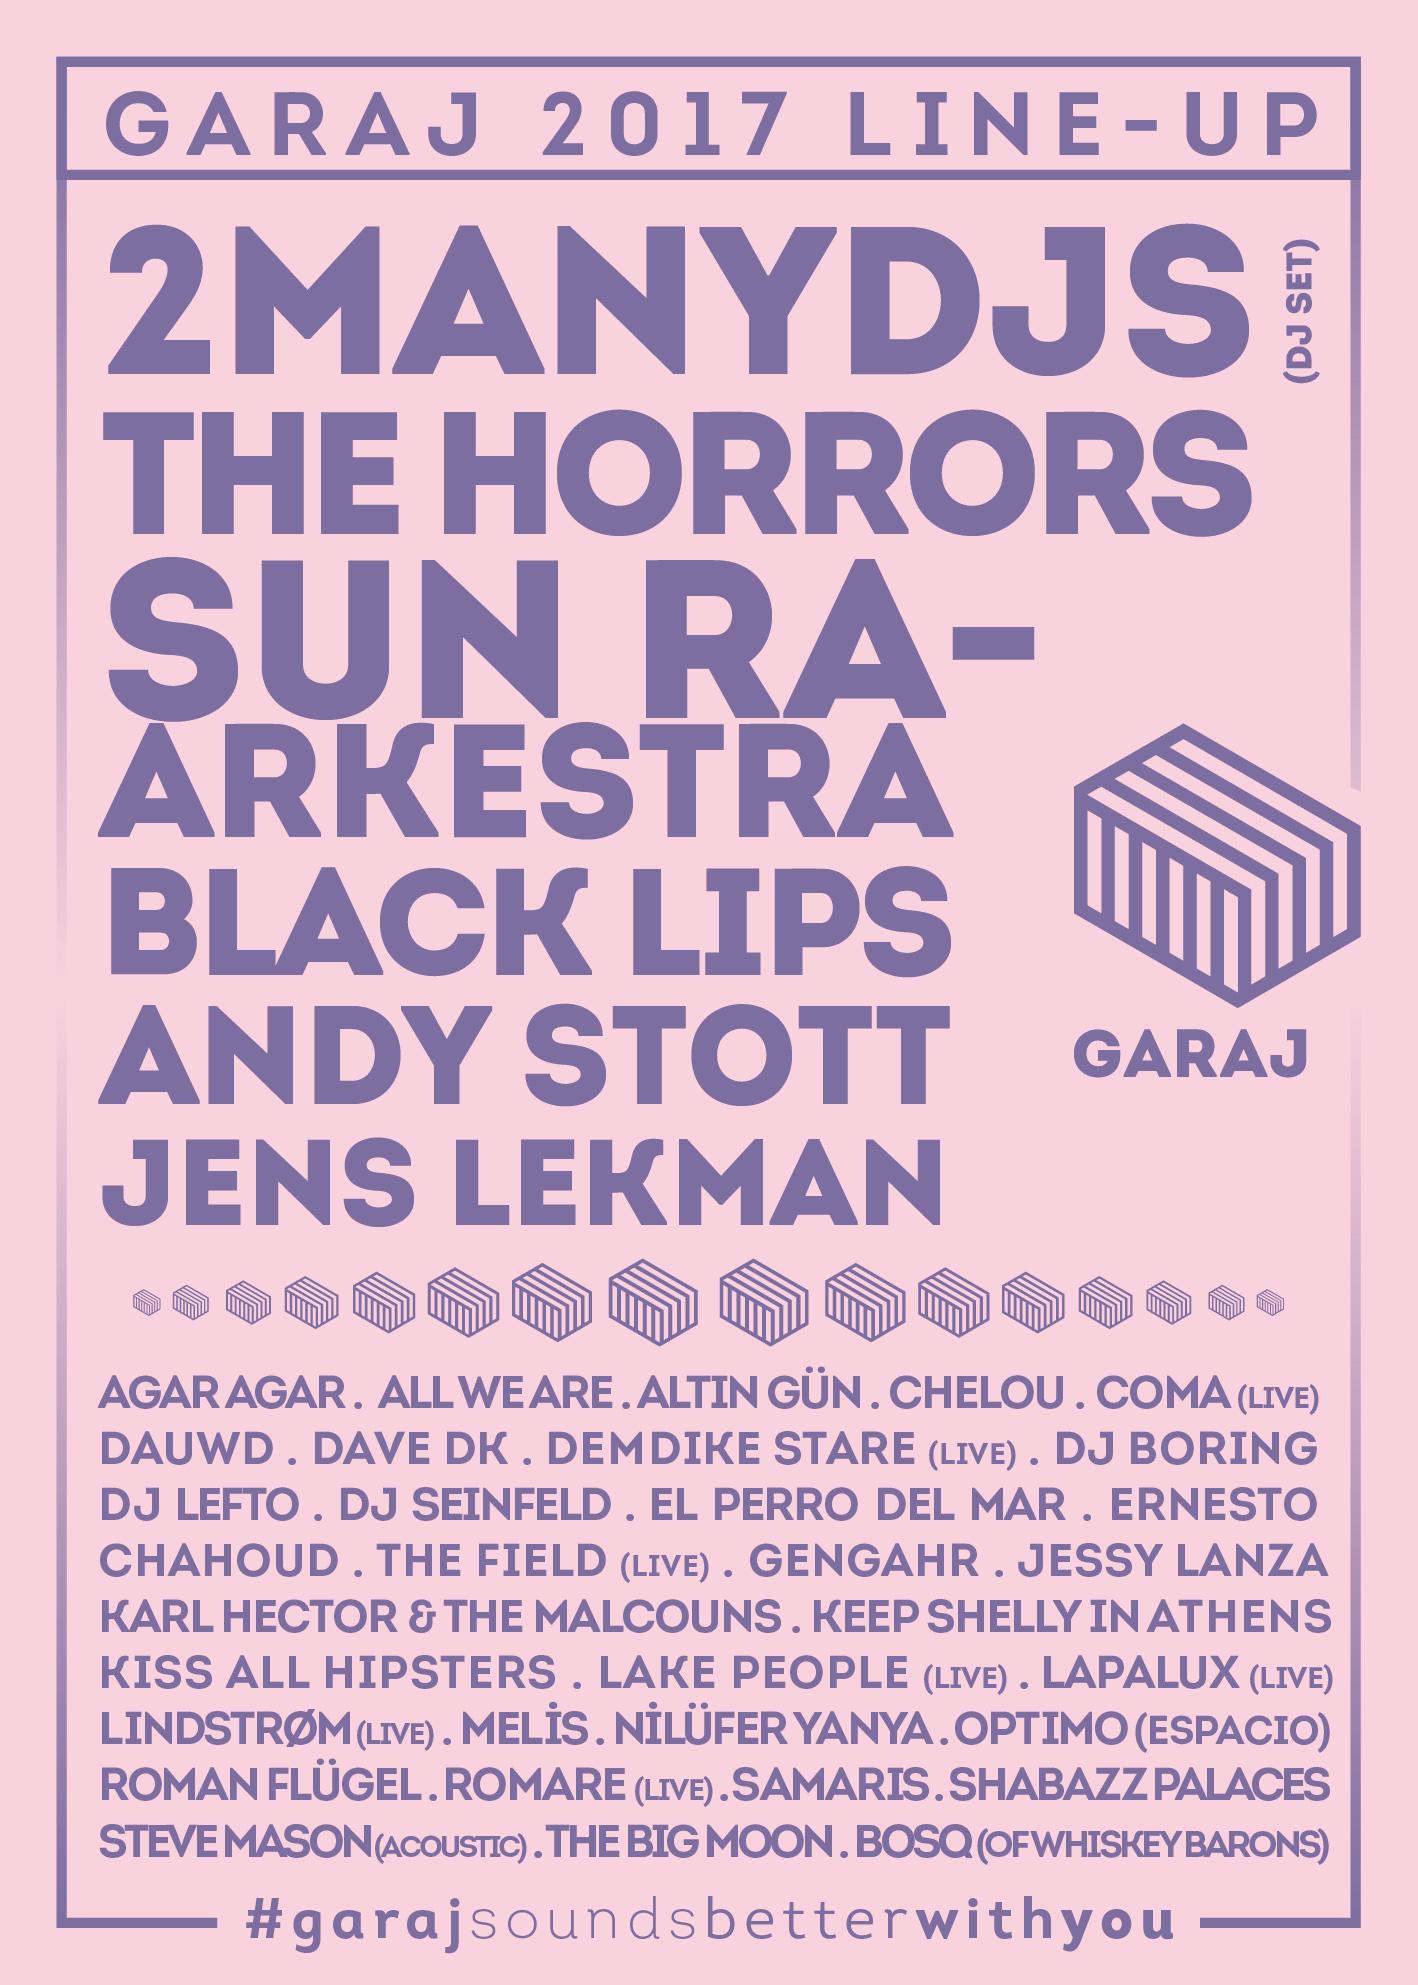 Garaj_2017_Line-Up_Poster_01